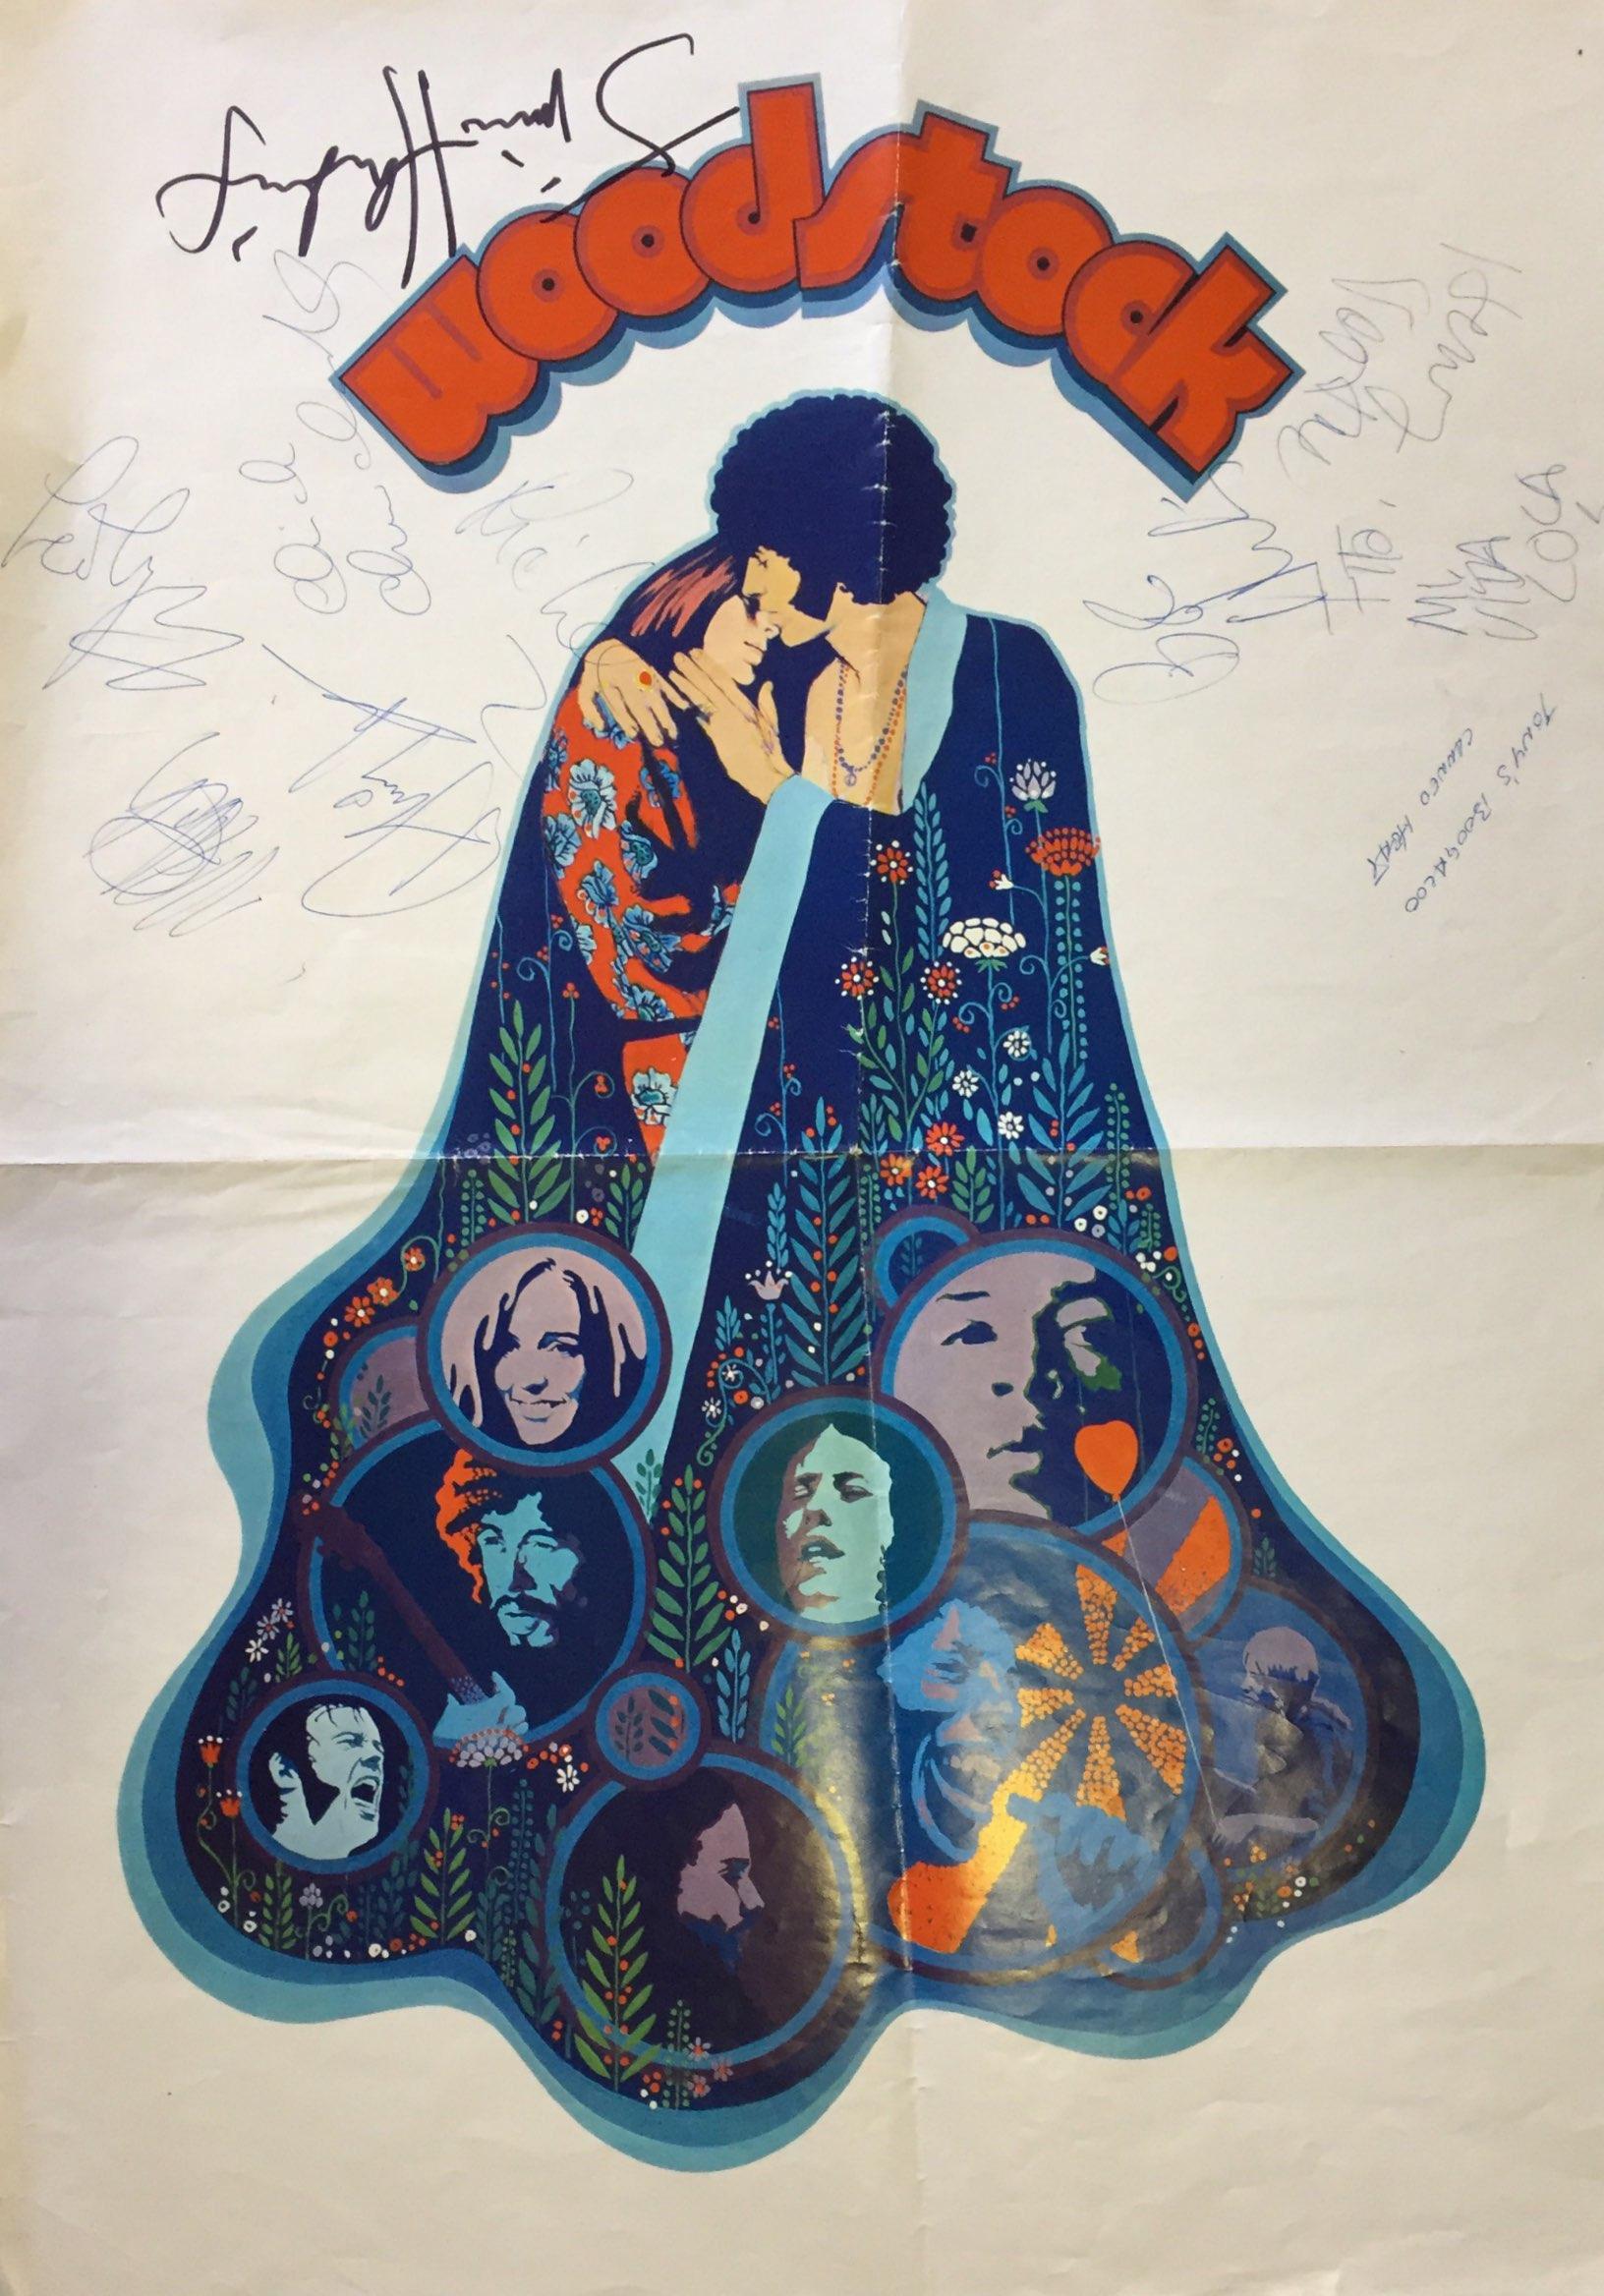 Lot 140 - HENDRIX JIMI: (1942-1970) American Music